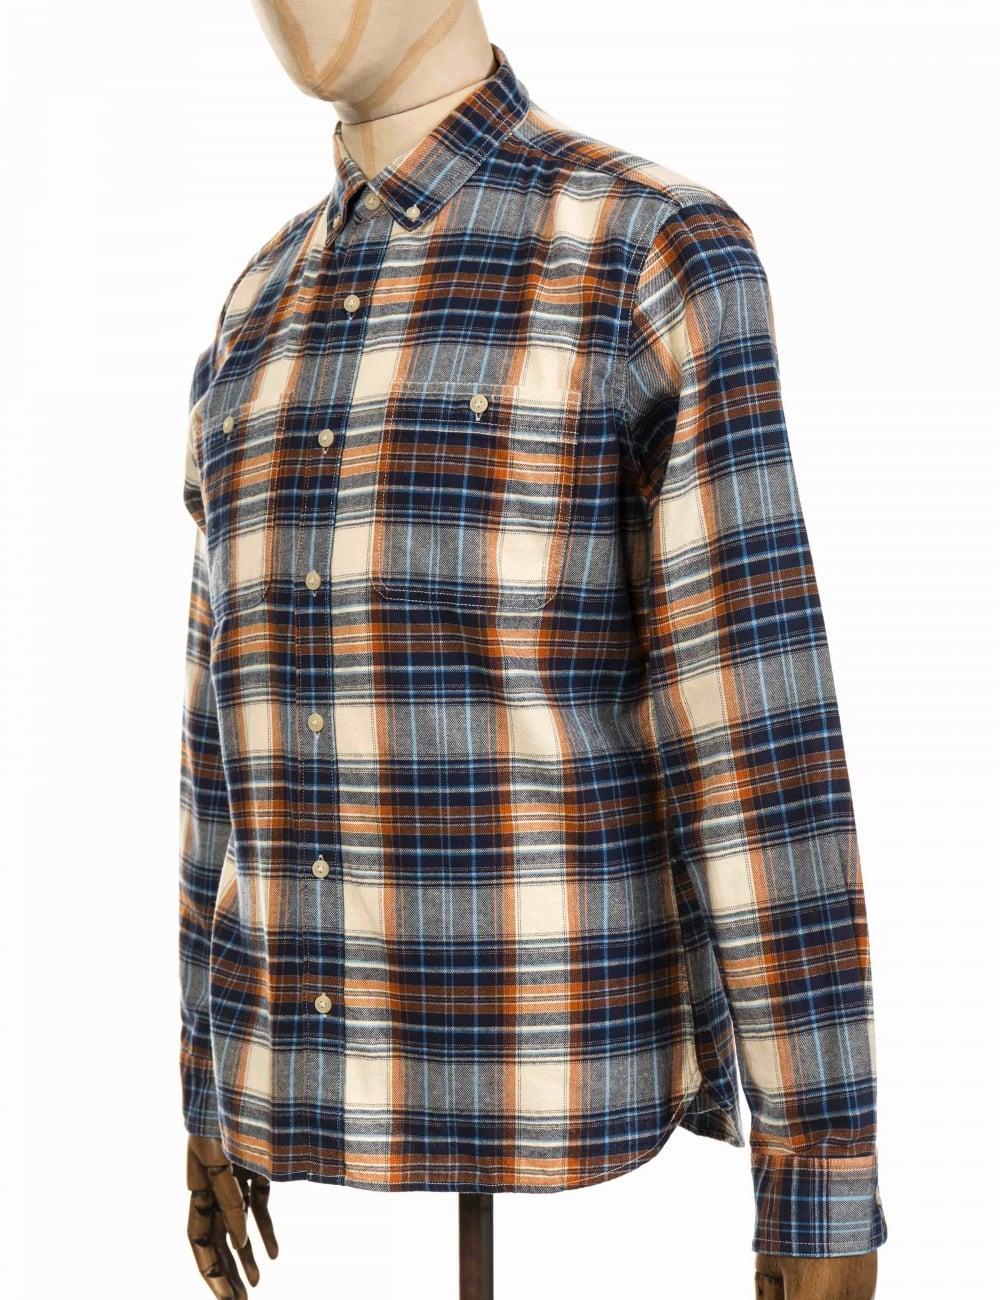 ee5e7ebdb30 Edwin Jeans Standard Triple 10 Check Shirt - Blue Rust - Clothing ...